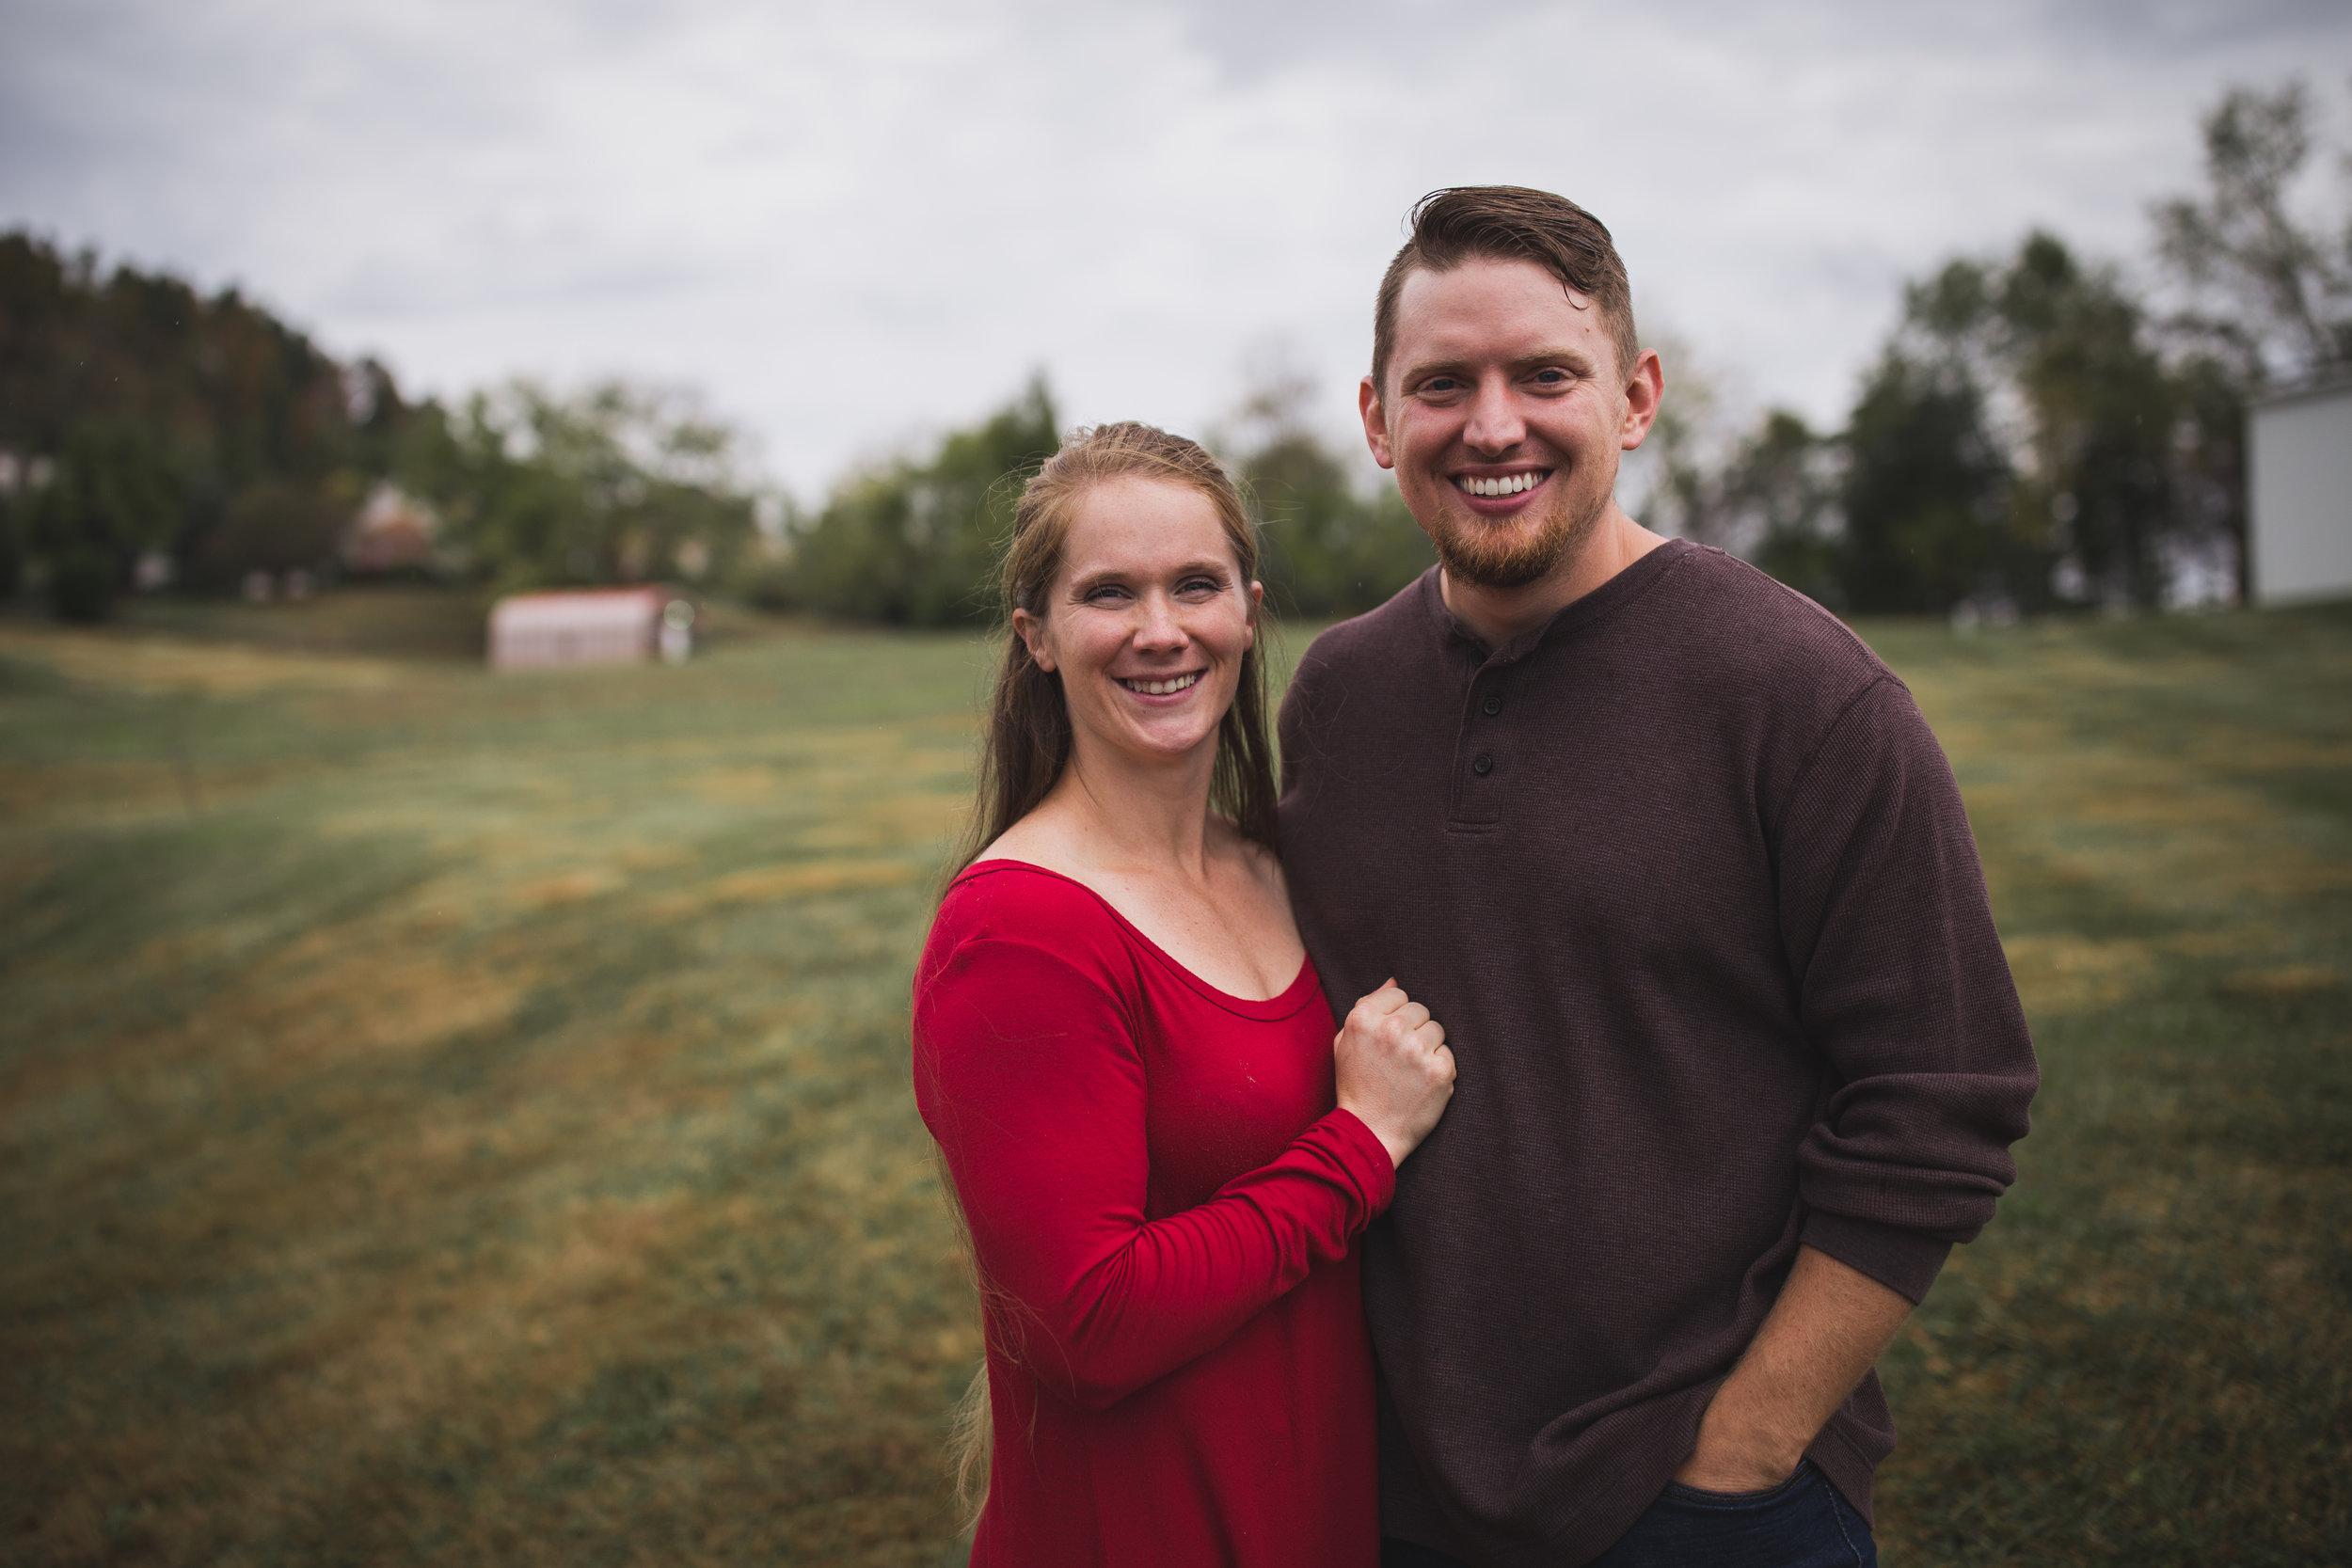 Justin + Melody Honaker  Lead Pastors  justin@lcfchurch.us